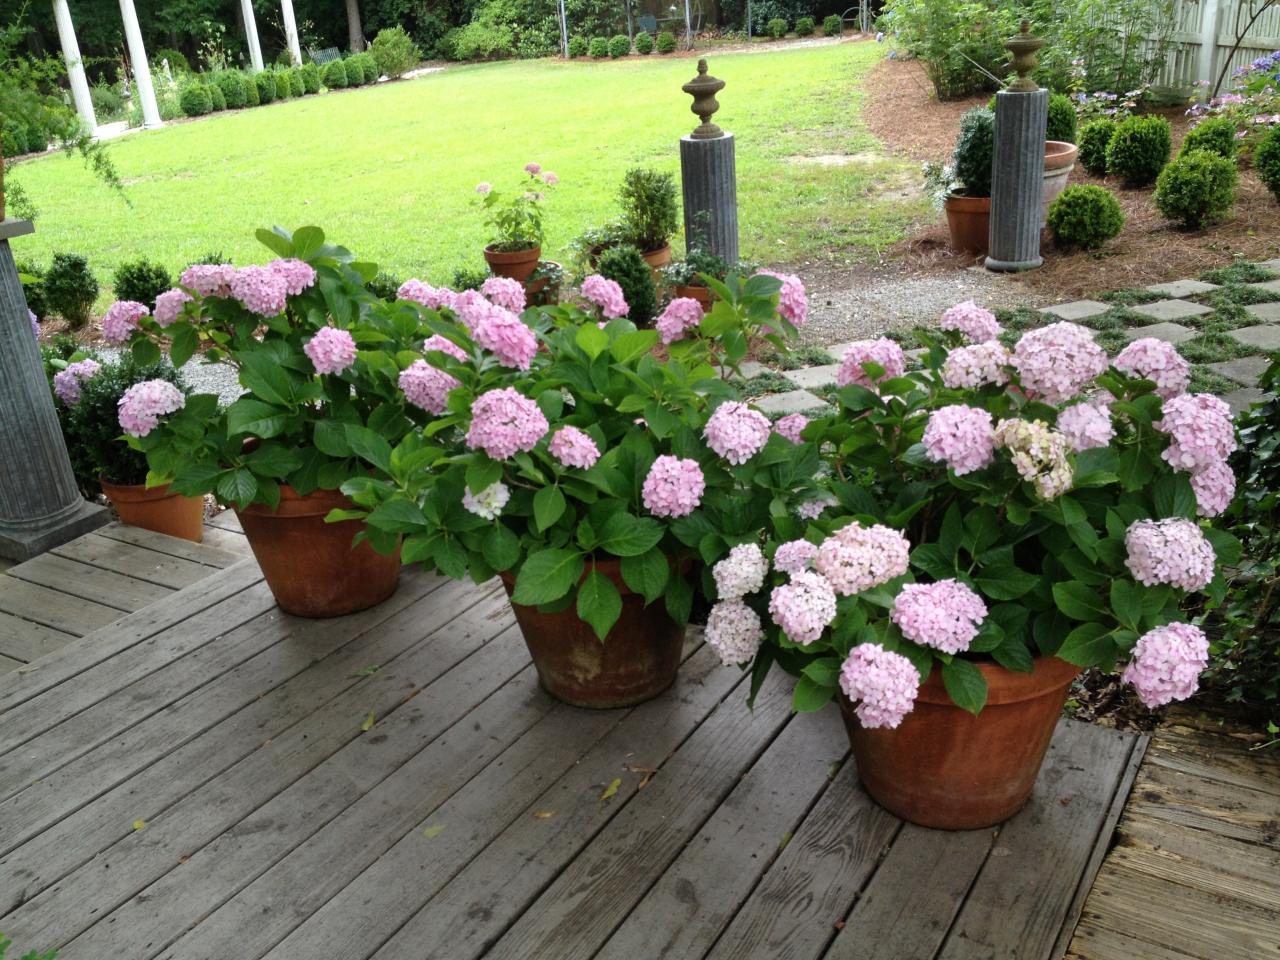 Drawn pot plant sick In Pots Pots Hydrangeas in